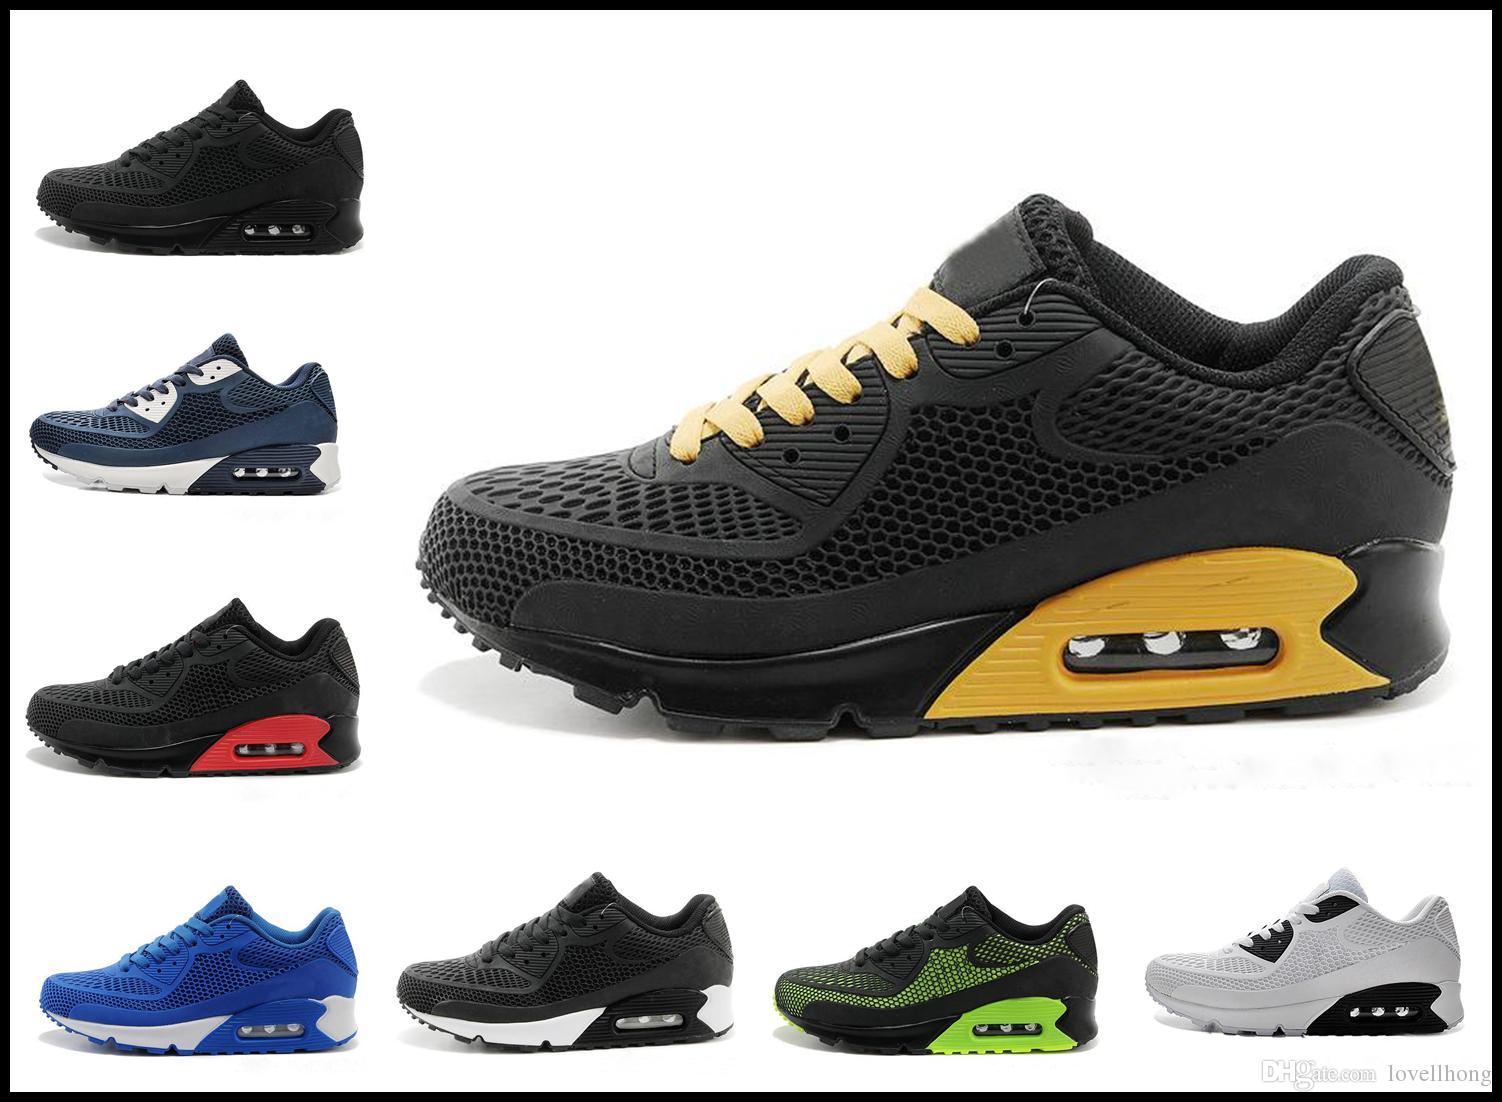 running | Nike Herren Air Max 90 Essential BlackWhite, Schwarz ⋆ Pension Funke